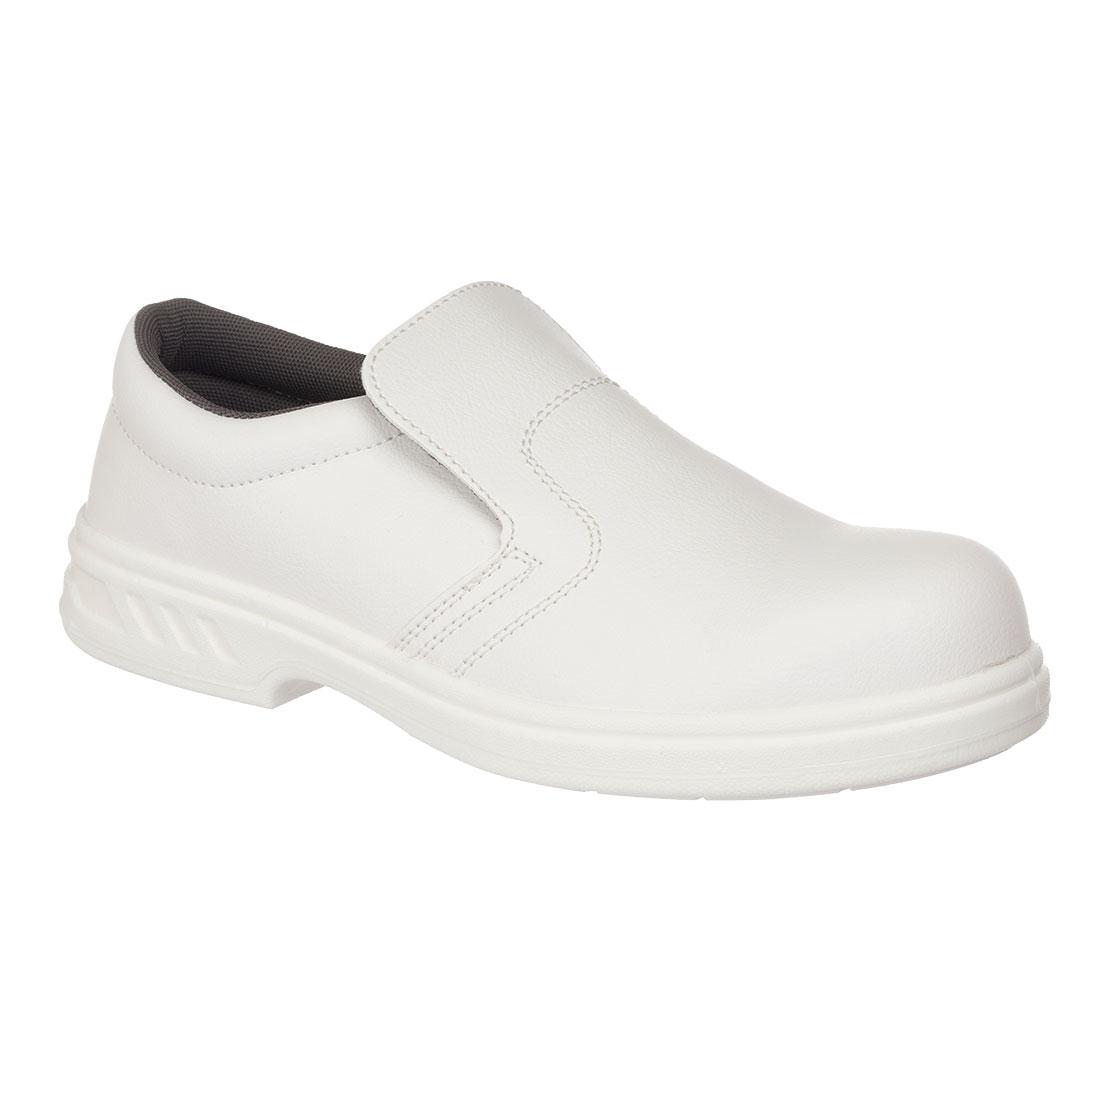 Slip-On Safety Shoe  S2 White 37